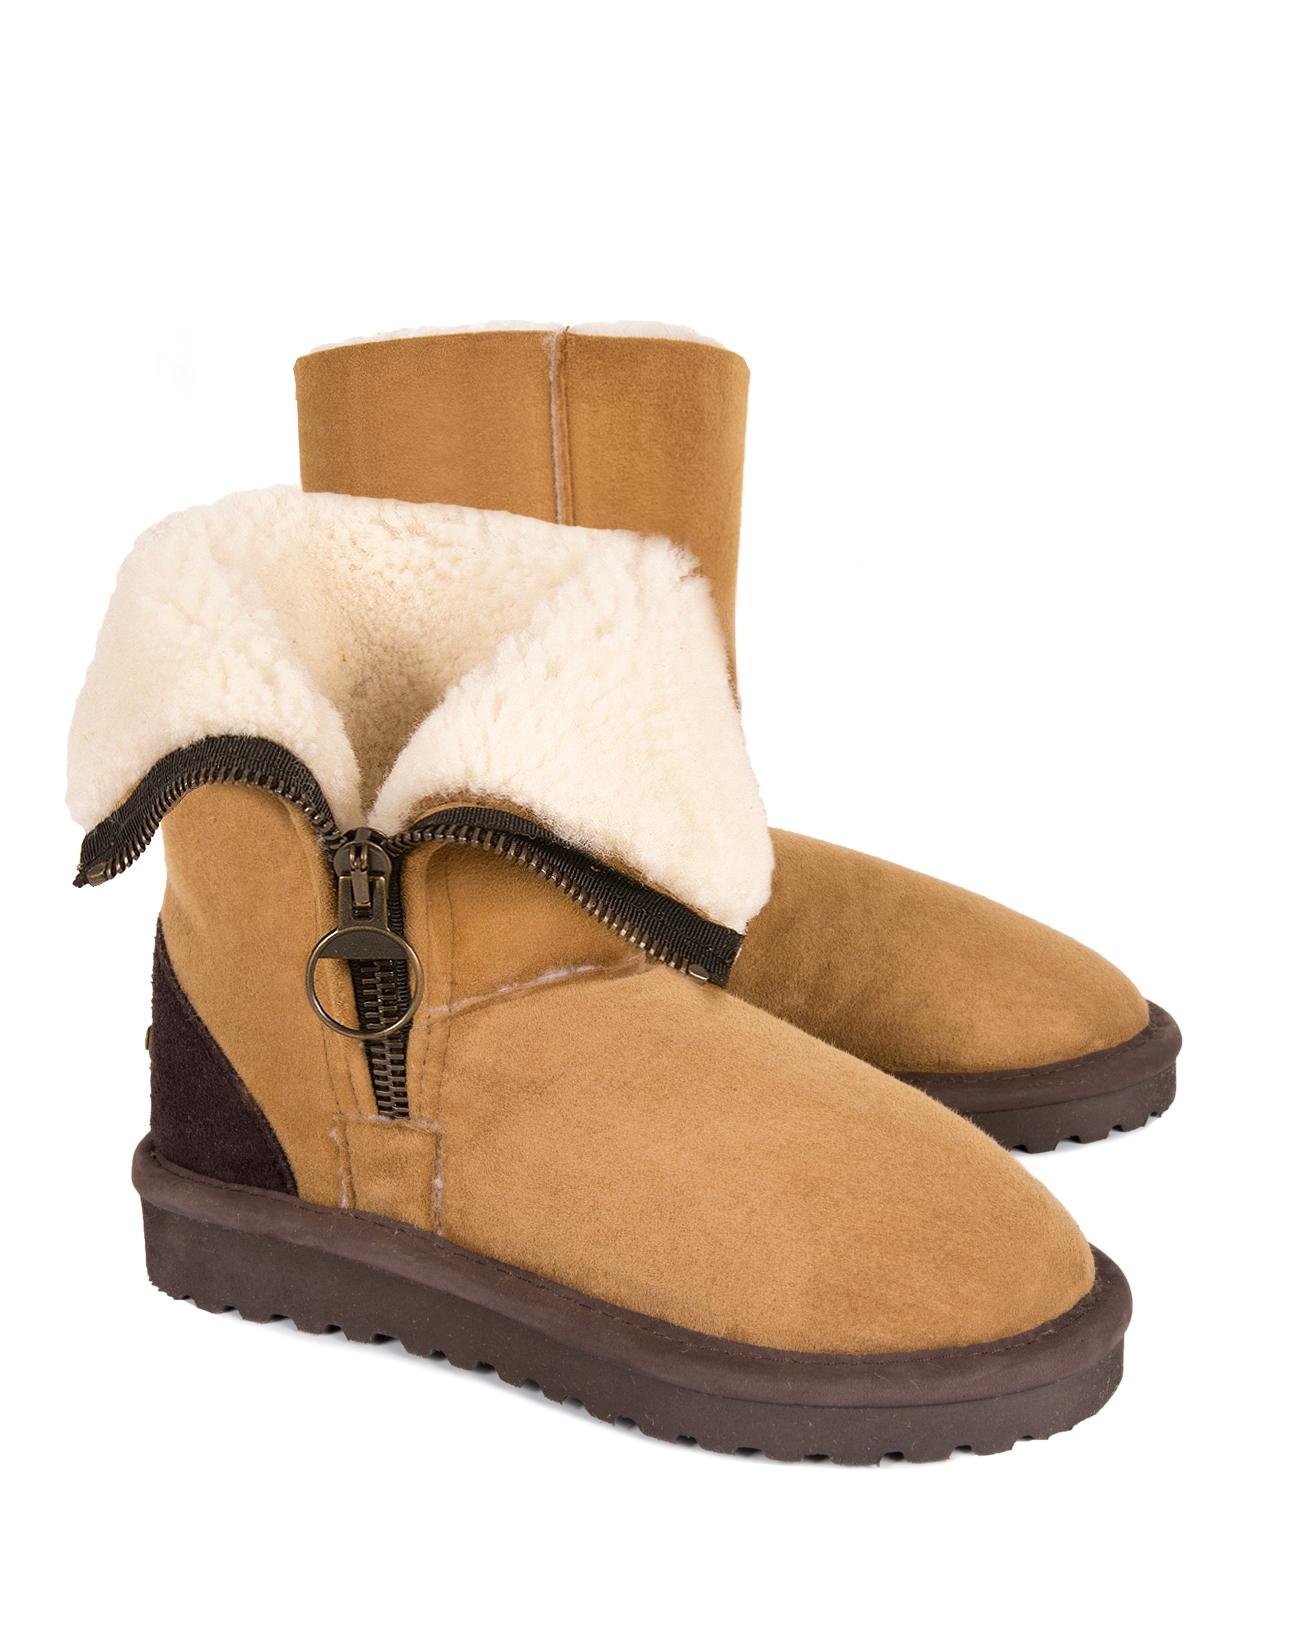 6612-aviator boots-spice-pair down-aw18.jpg